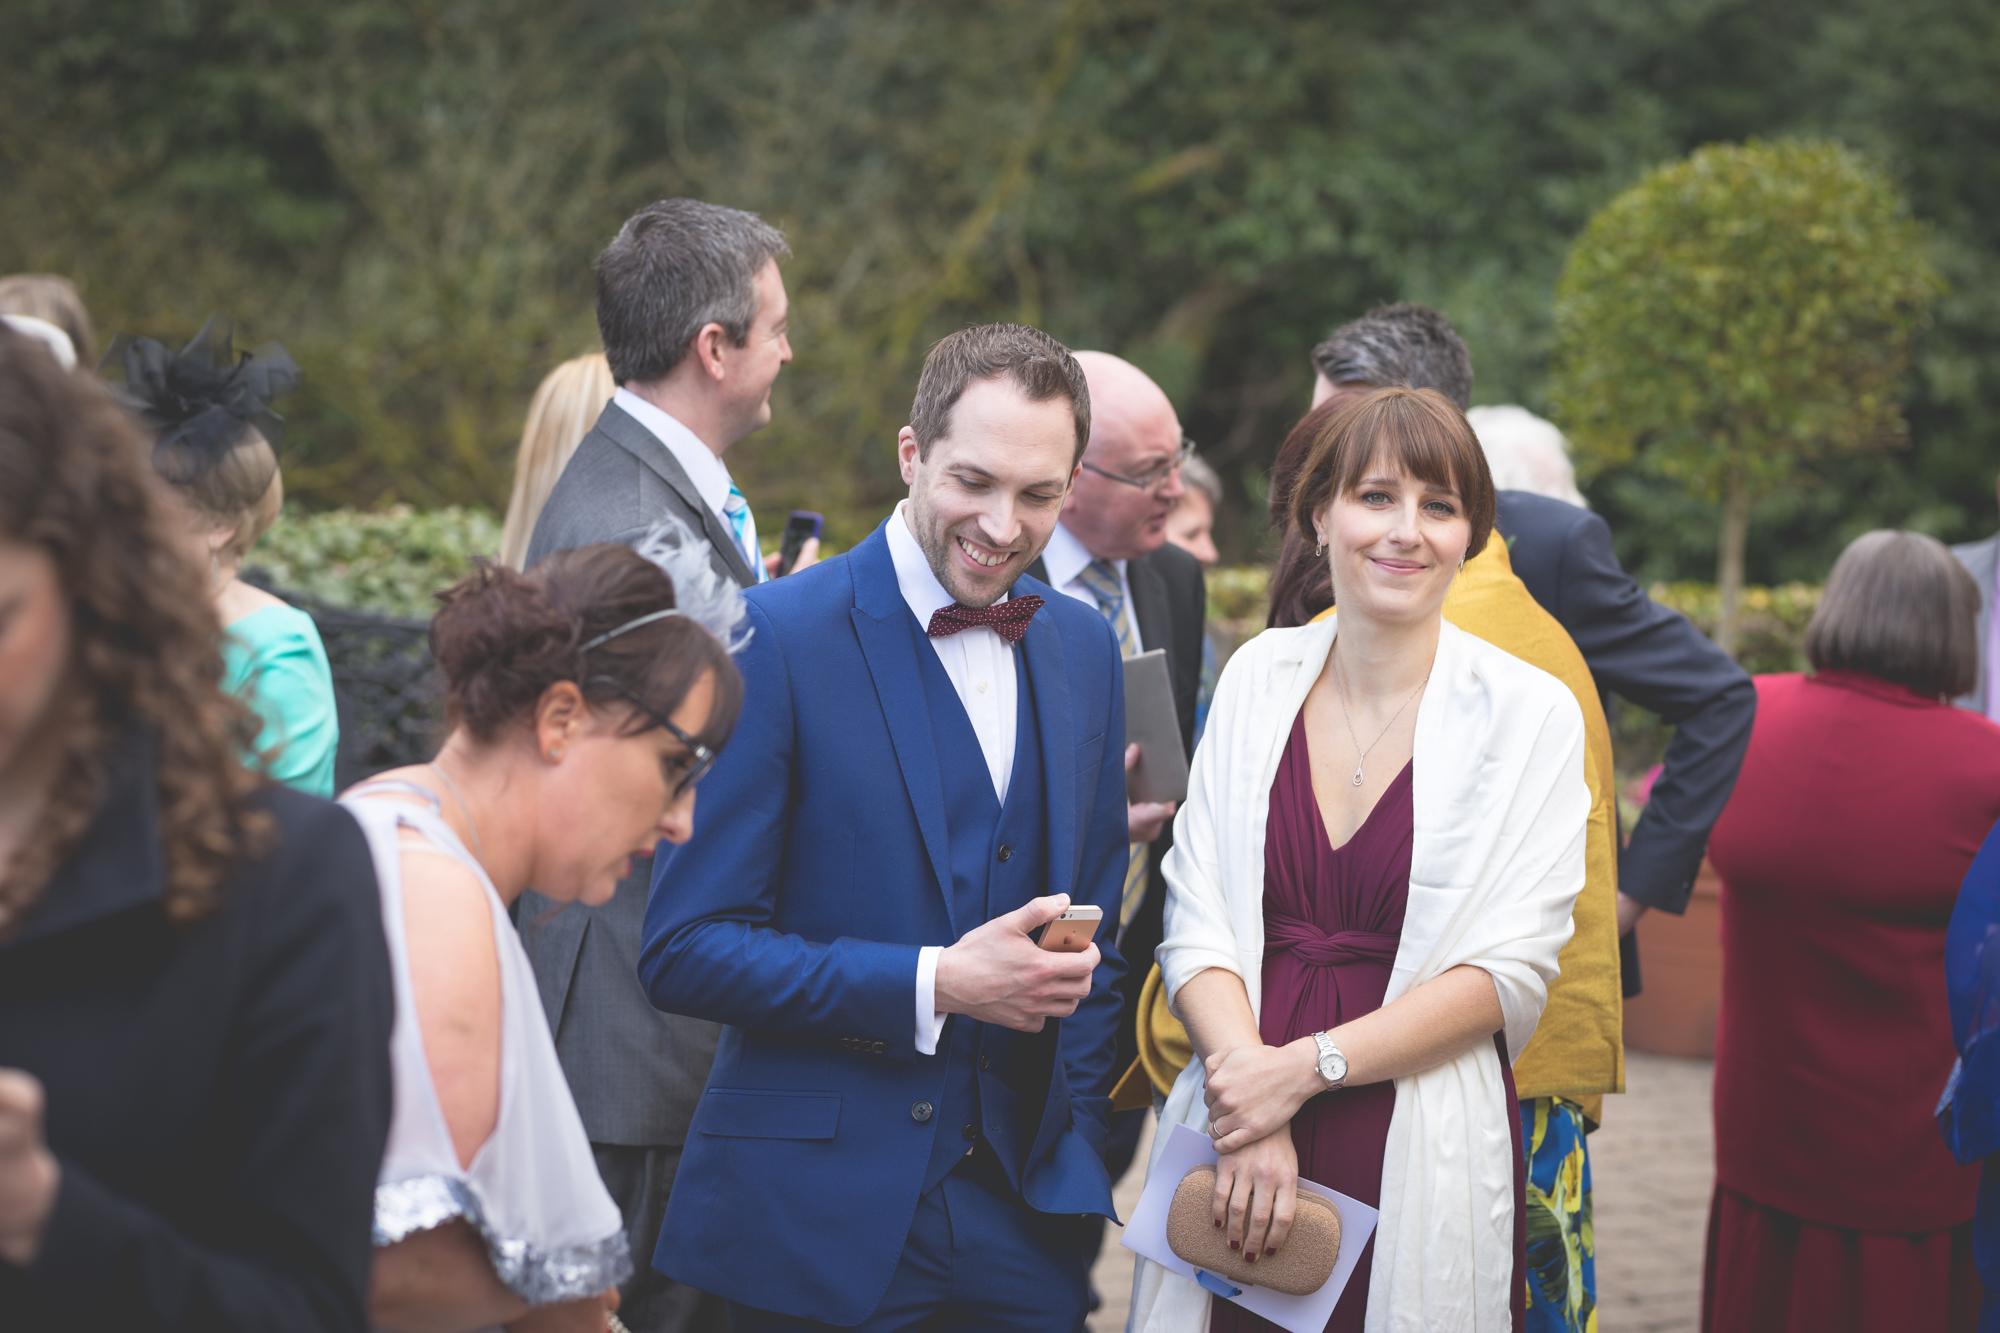 Steve_Emma_Ceremony-169.jpg